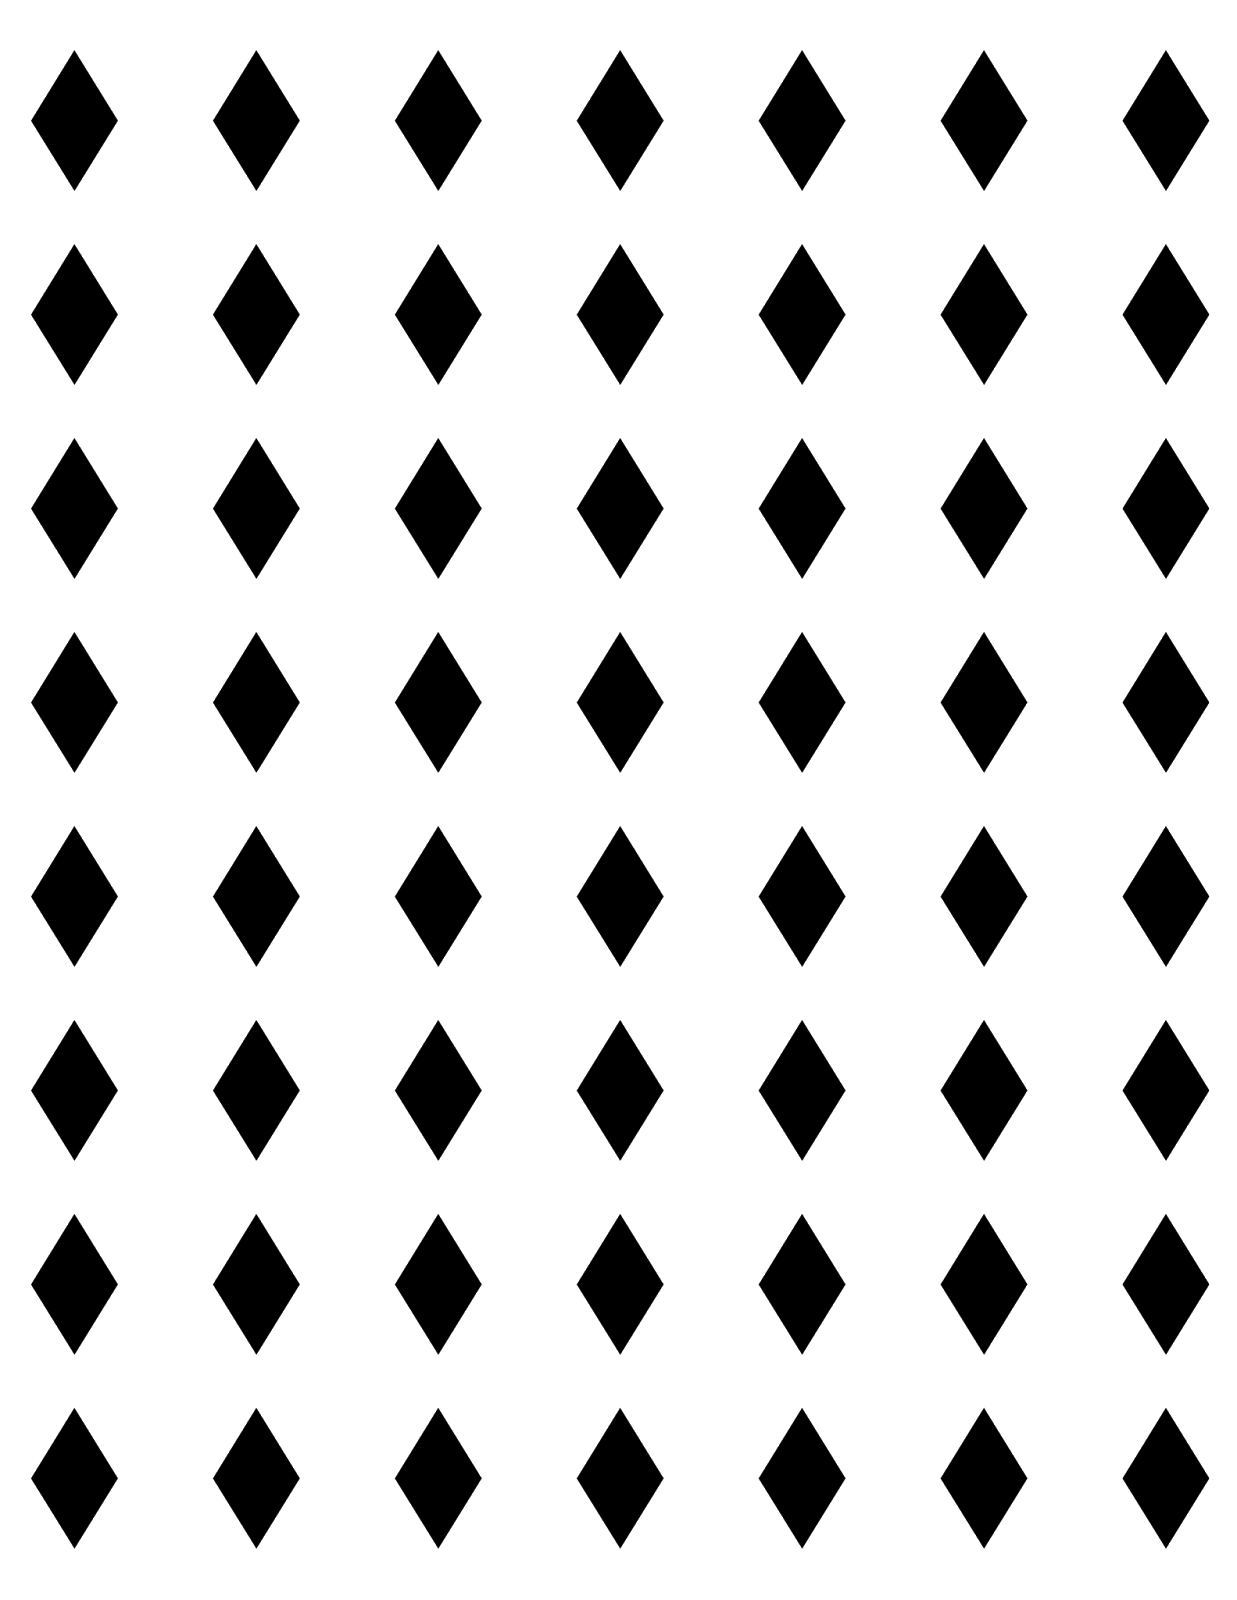 85X11+Diamond+Grid+Stencilpng (1237 1600)